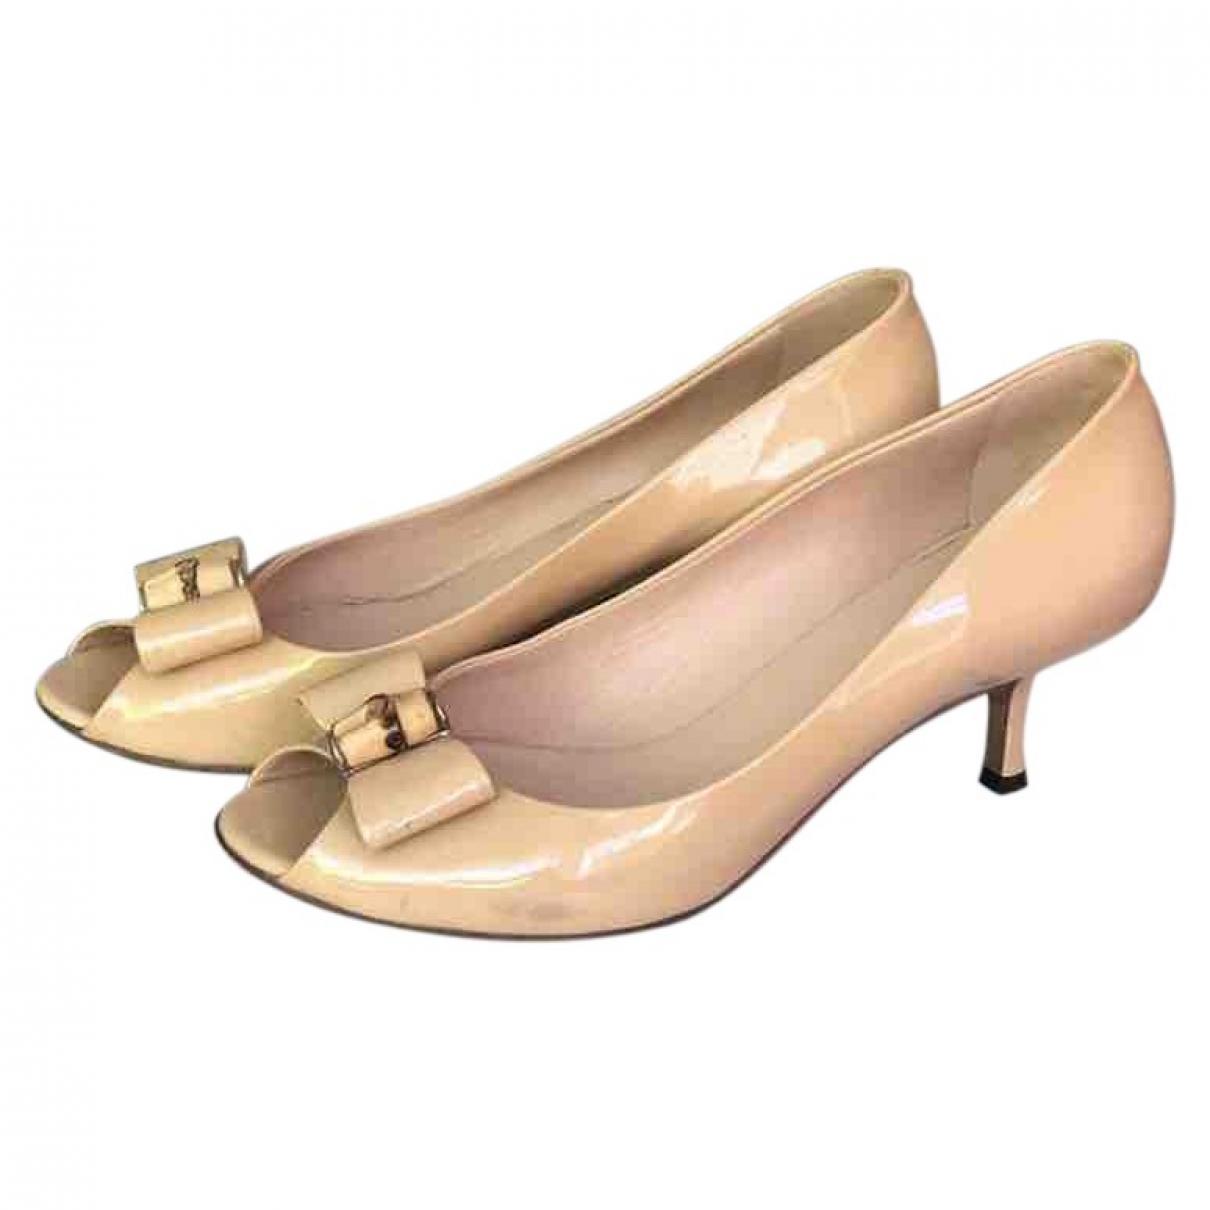 Gucci \N Beige Patent leather Heels for Women 37 EU